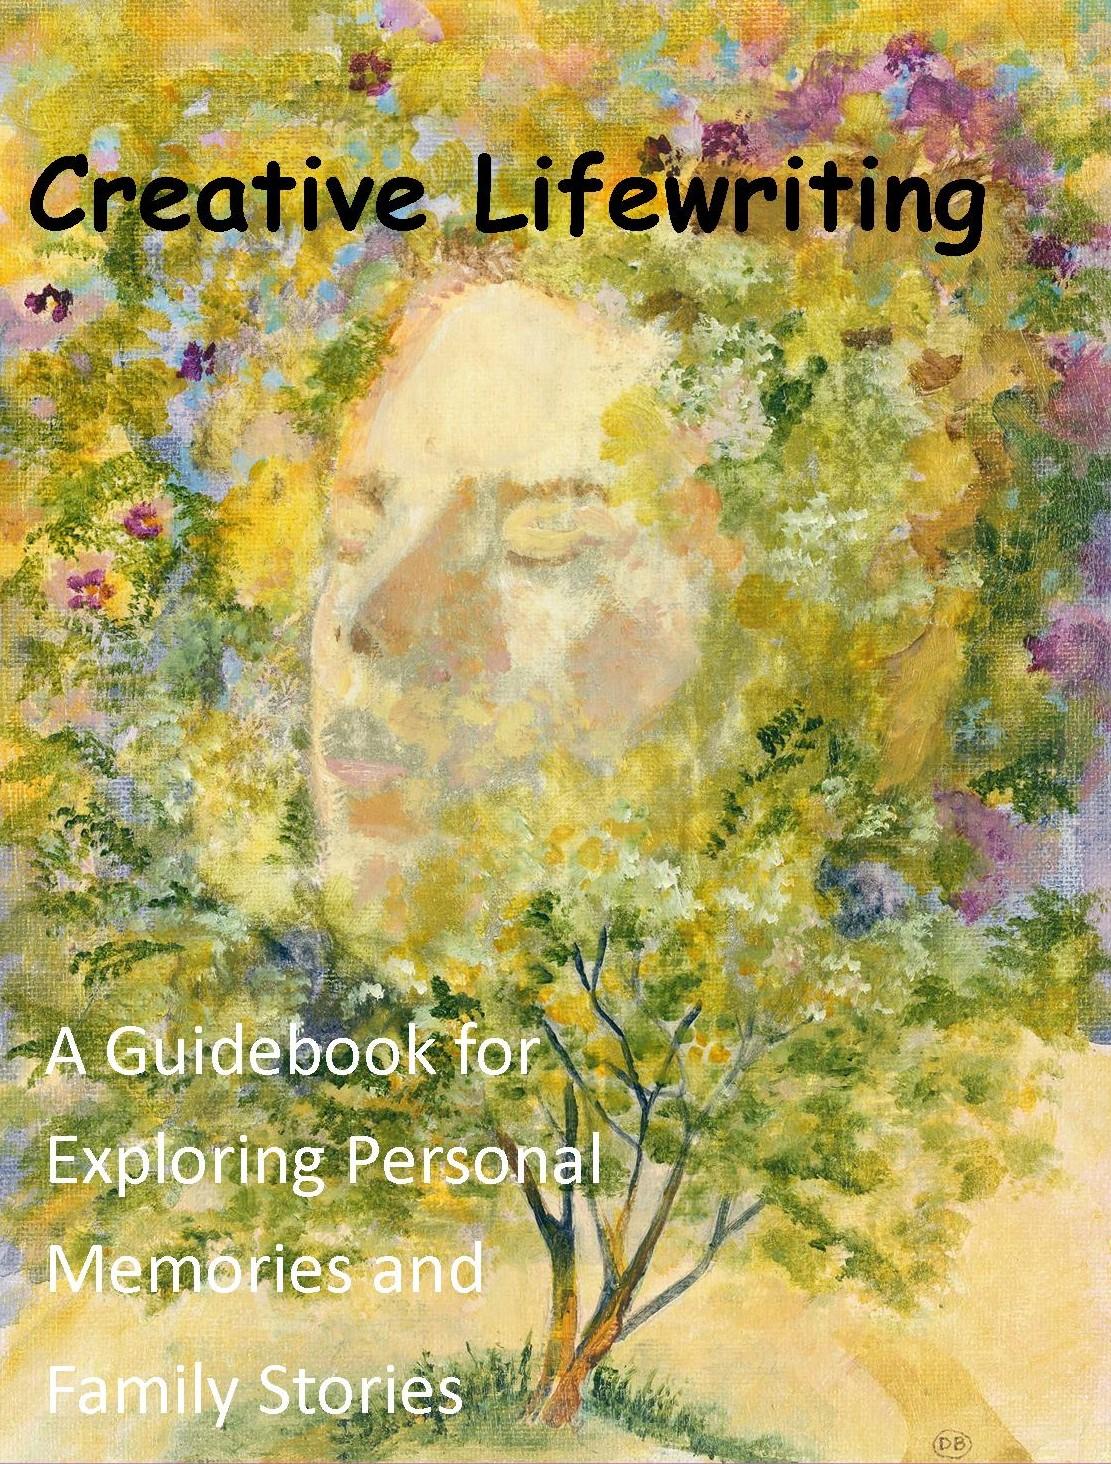 Creative Lifewriting